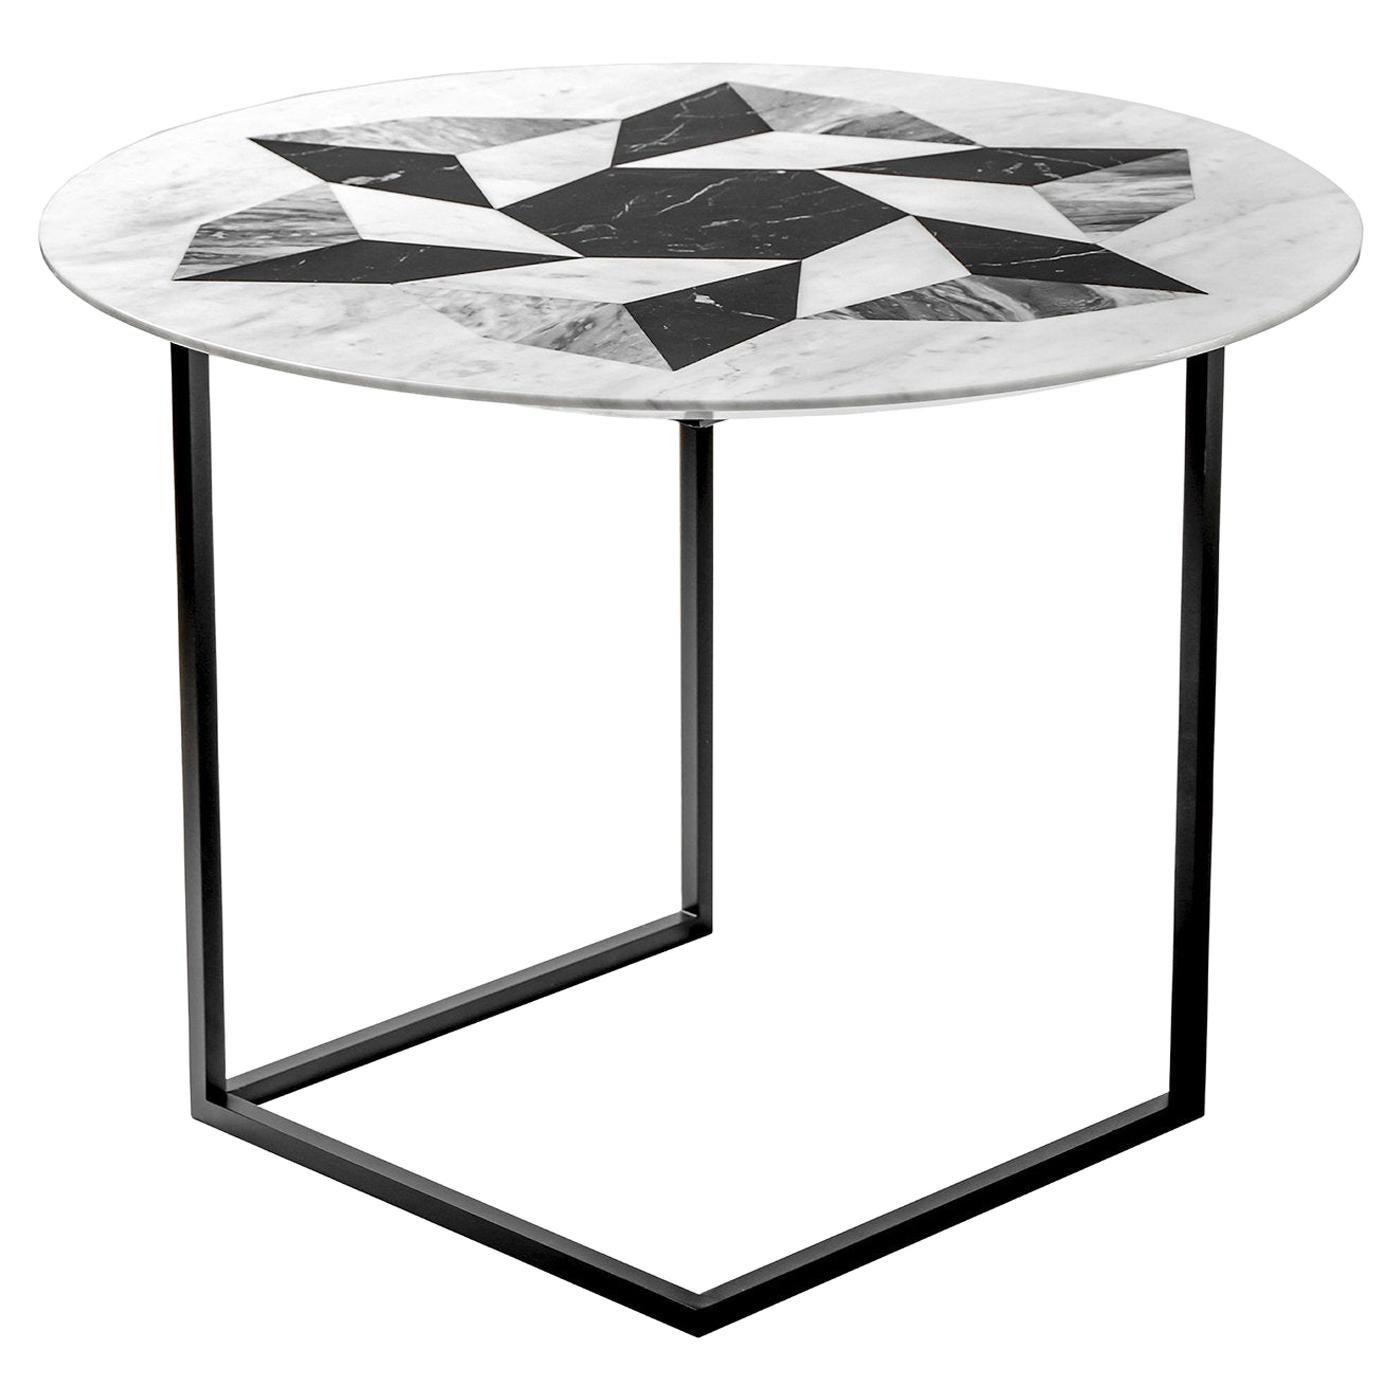 Esopo Side Table with Geometric Wheel by Antonio Saporito